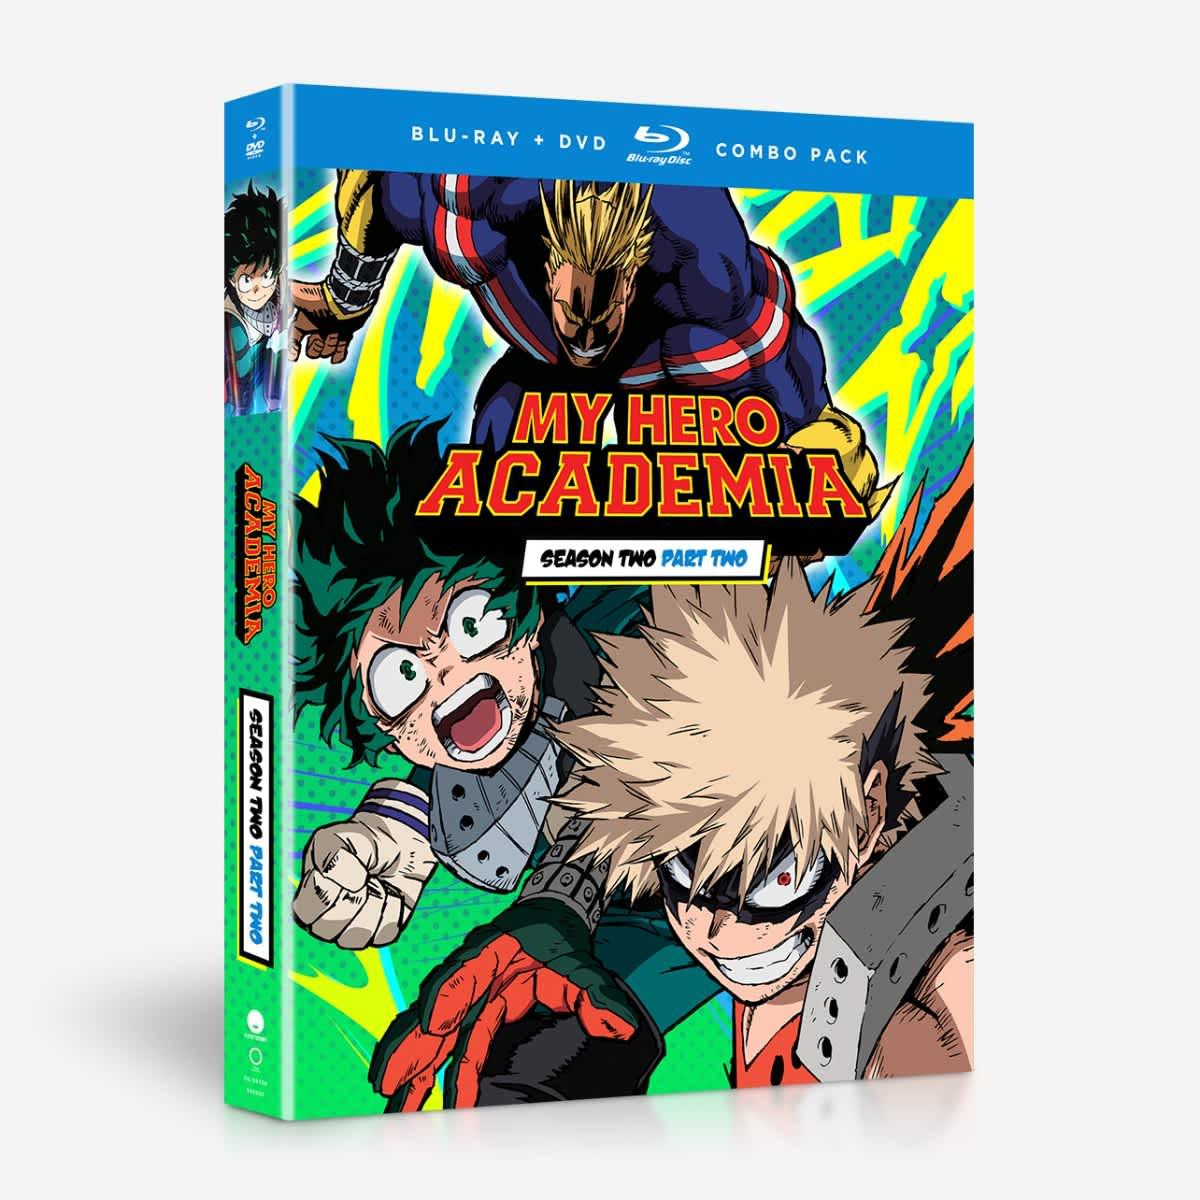 My Hero Academia Season 2 Part 2 Blu-ray/DVD 704400097669